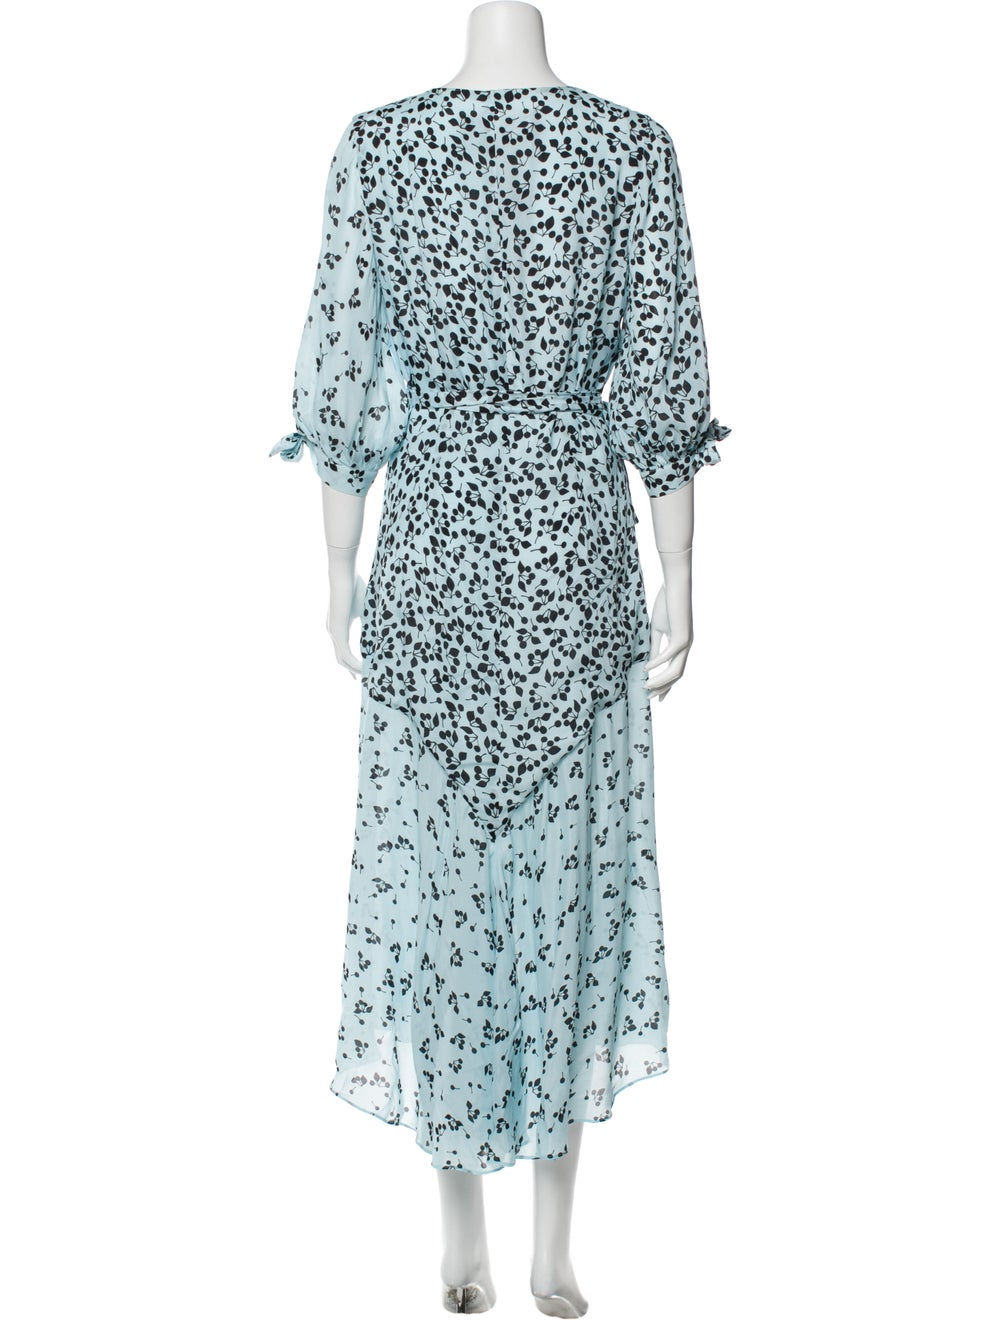 Paper London Printed Long Dress Blue - image 3